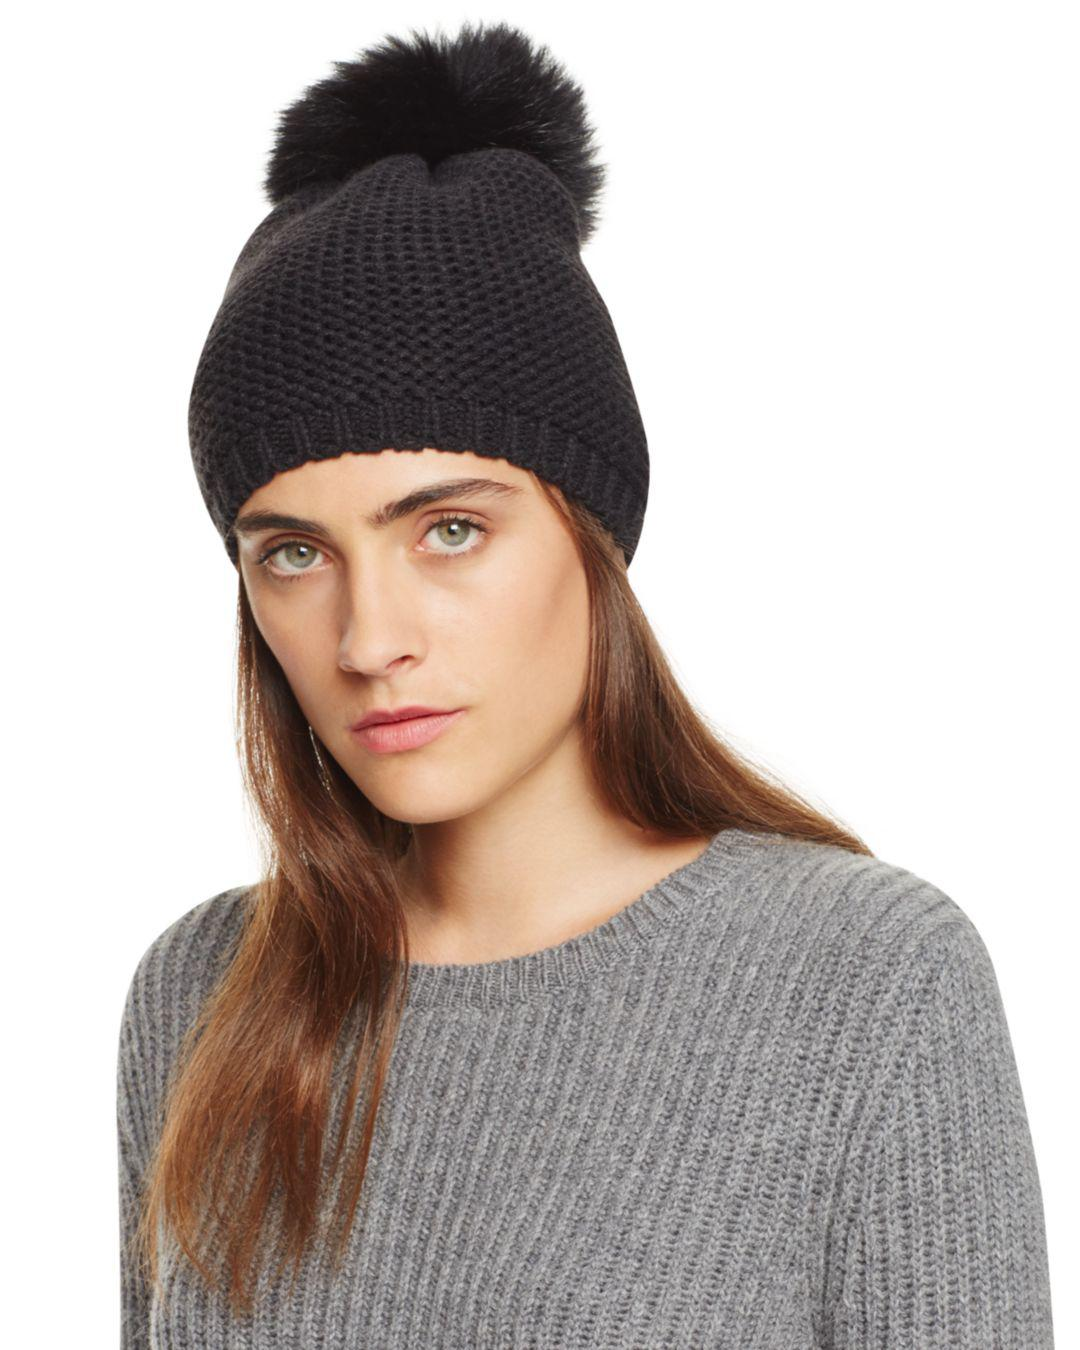 Kyi Kyi Slouchy Hat With Fox Fur Pom-pom in Black - Lyst bff1b0cdb9a5